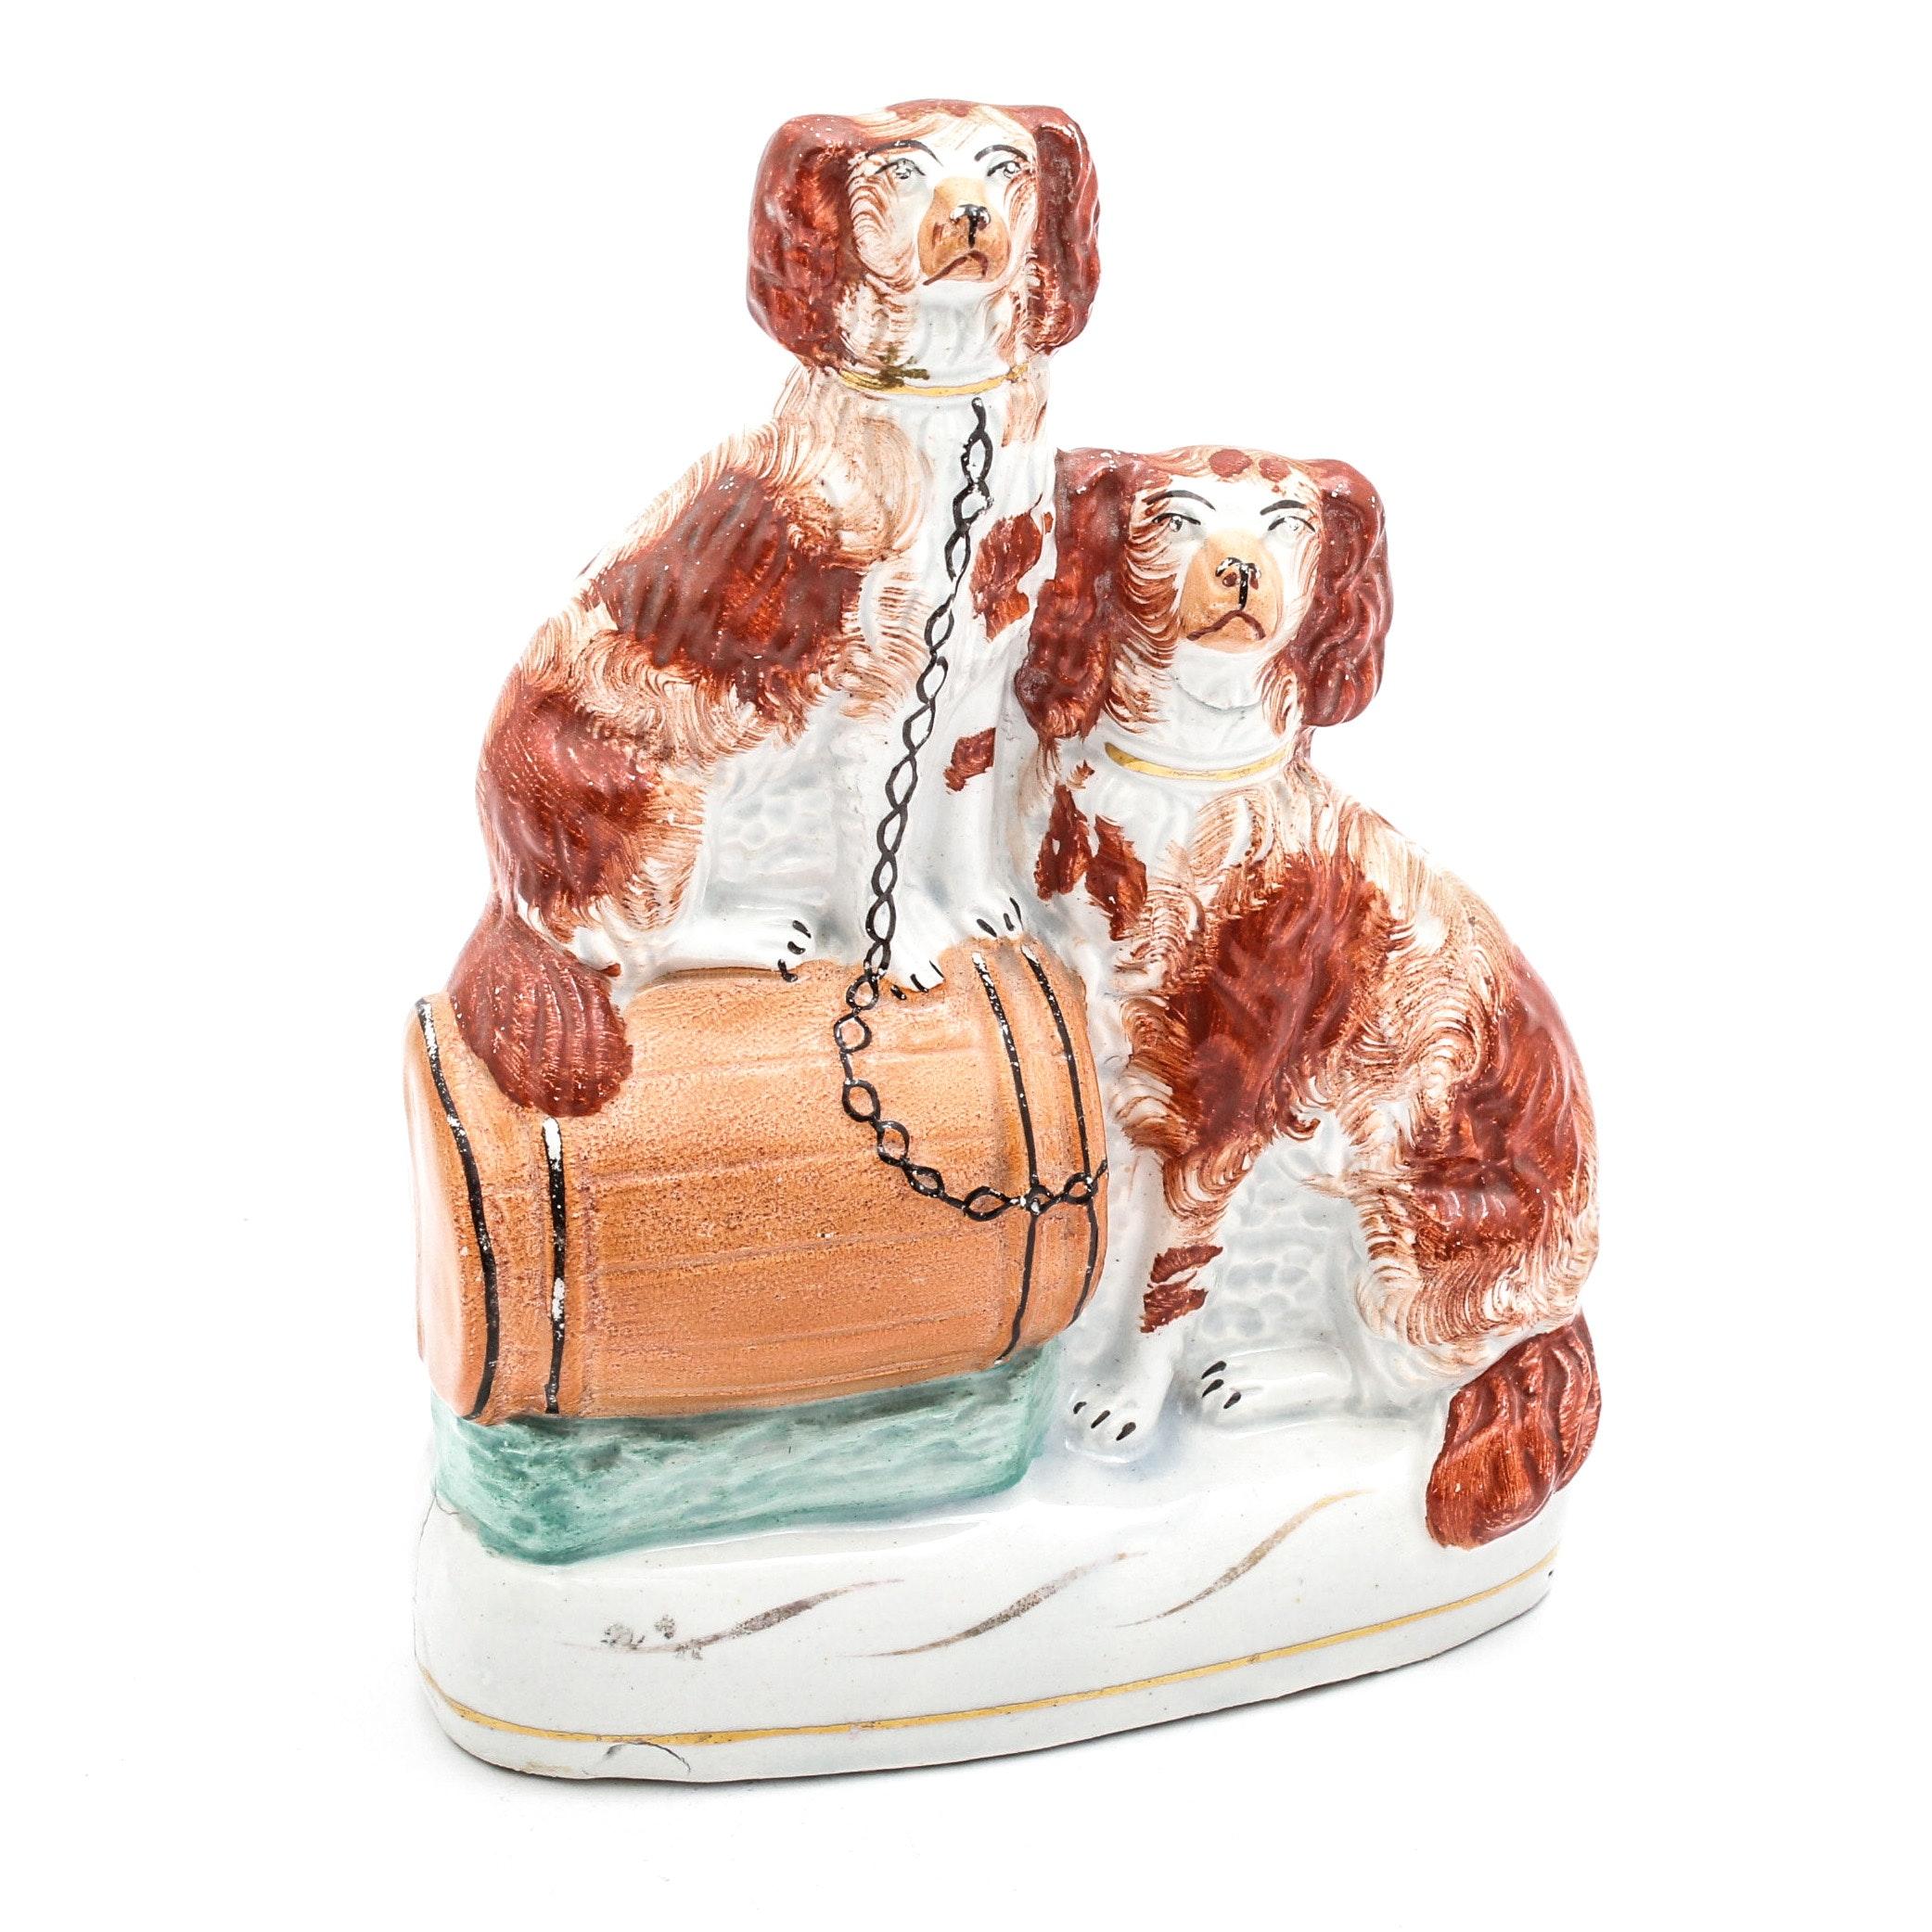 Staffordshire Ceramic Dogs